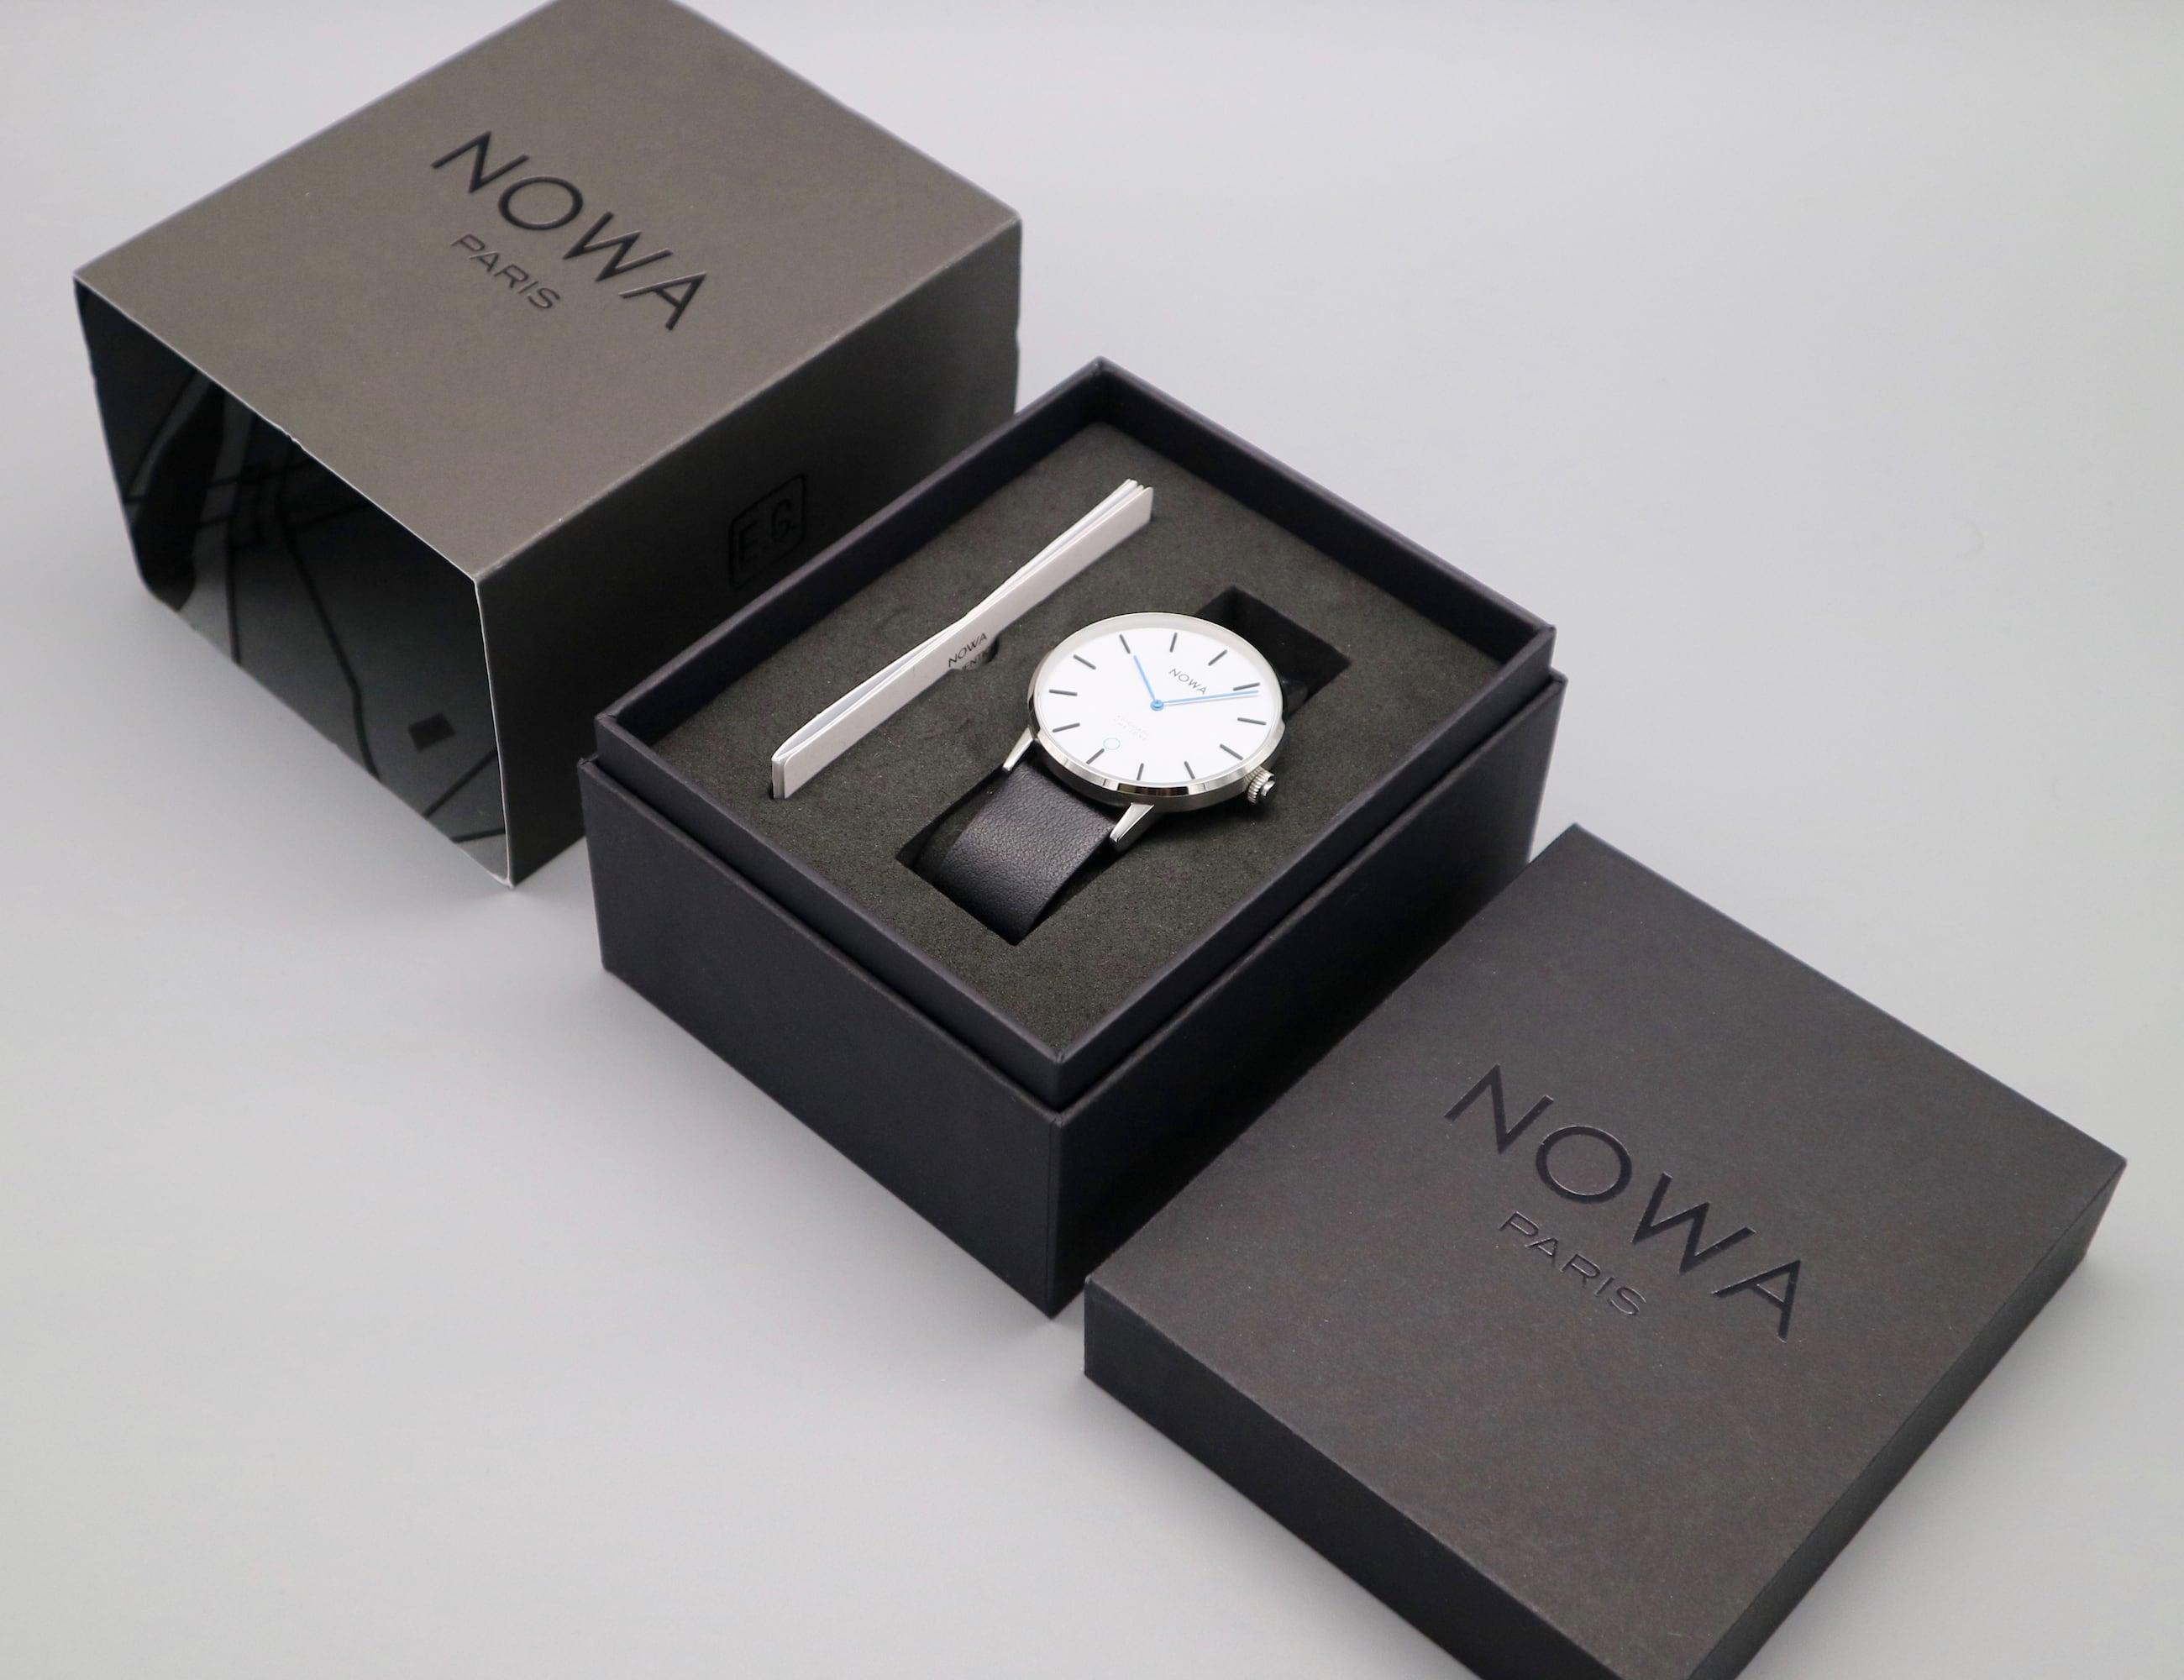 NOWA Shaper Ultra-Thin Hybrid Smartwatch